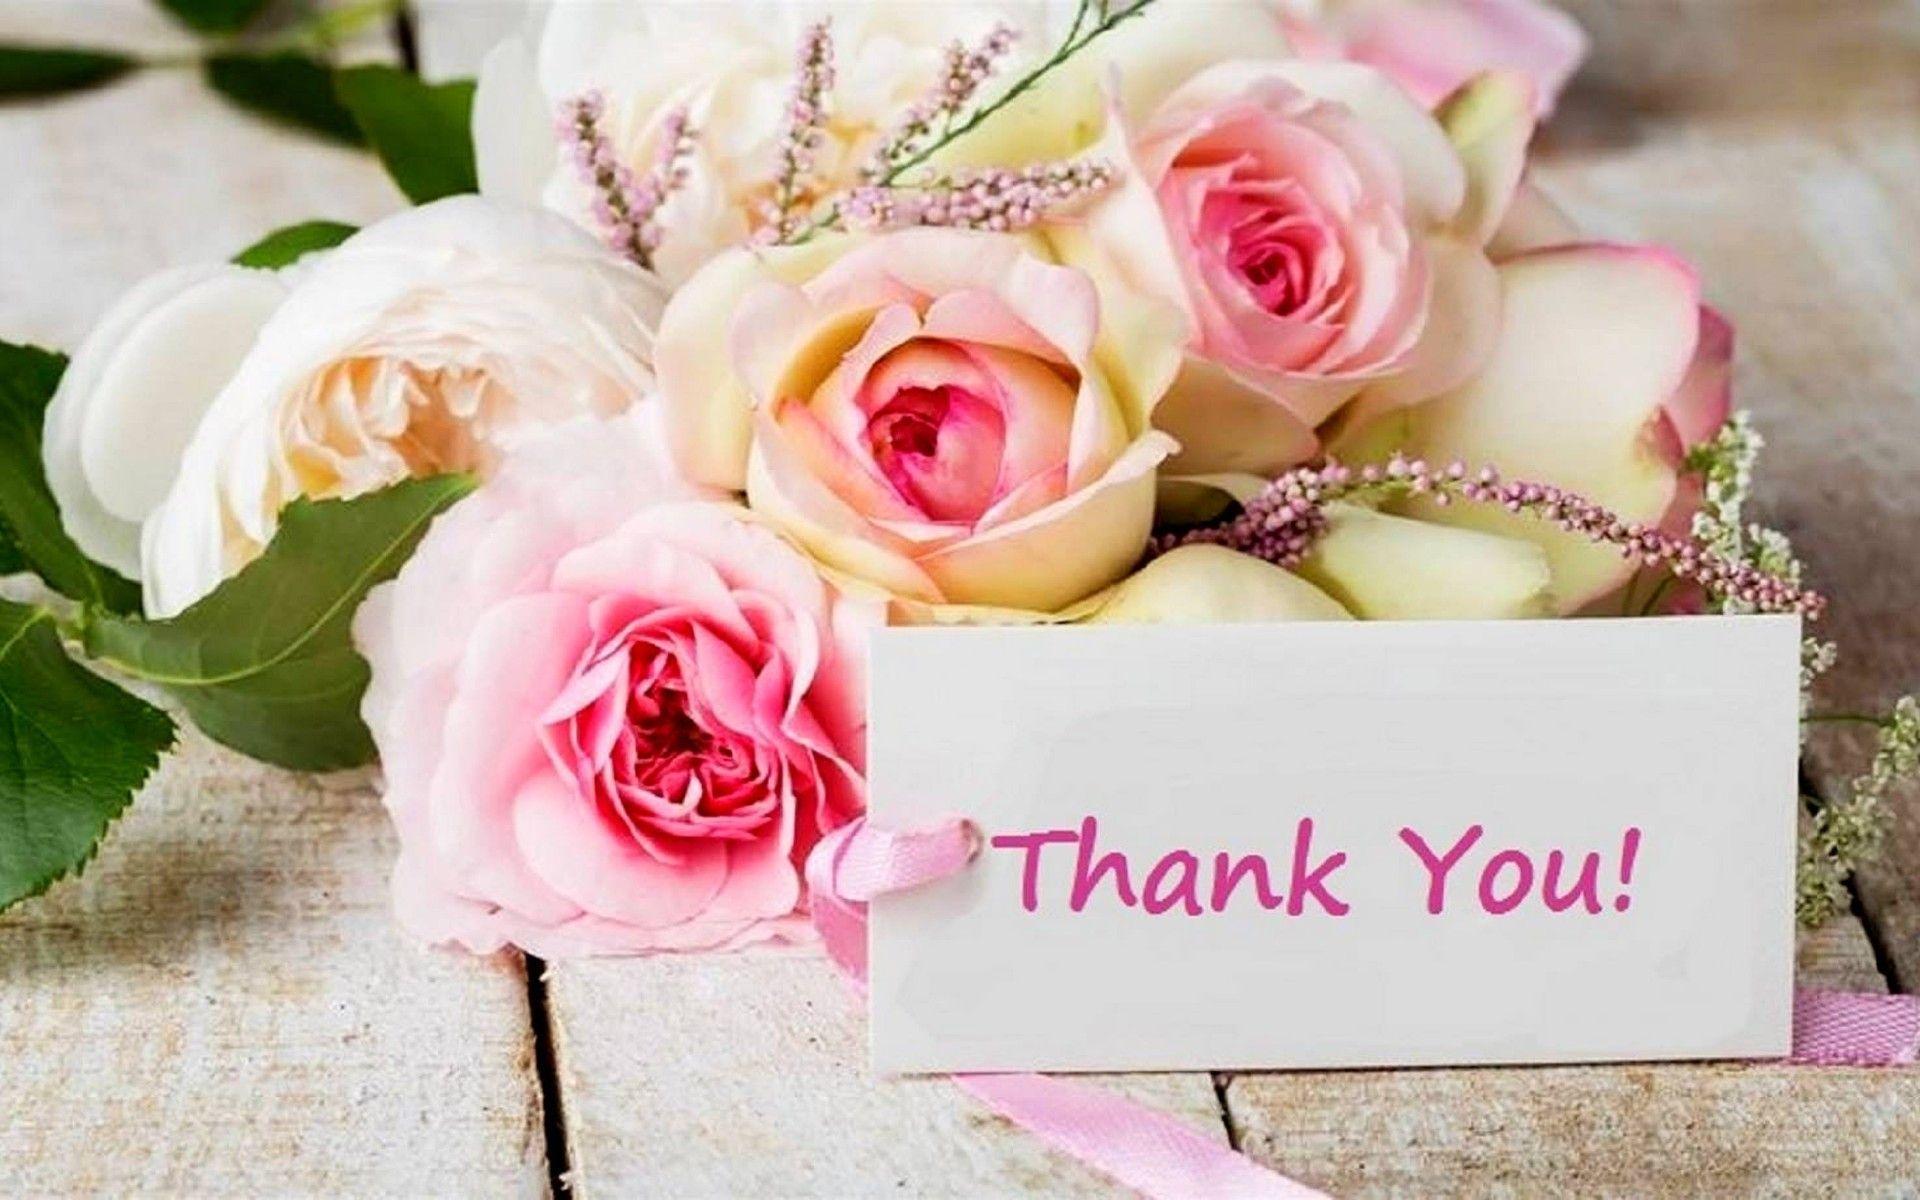 beautiful thank you | thank you, Розы, Спасибо, Открытки